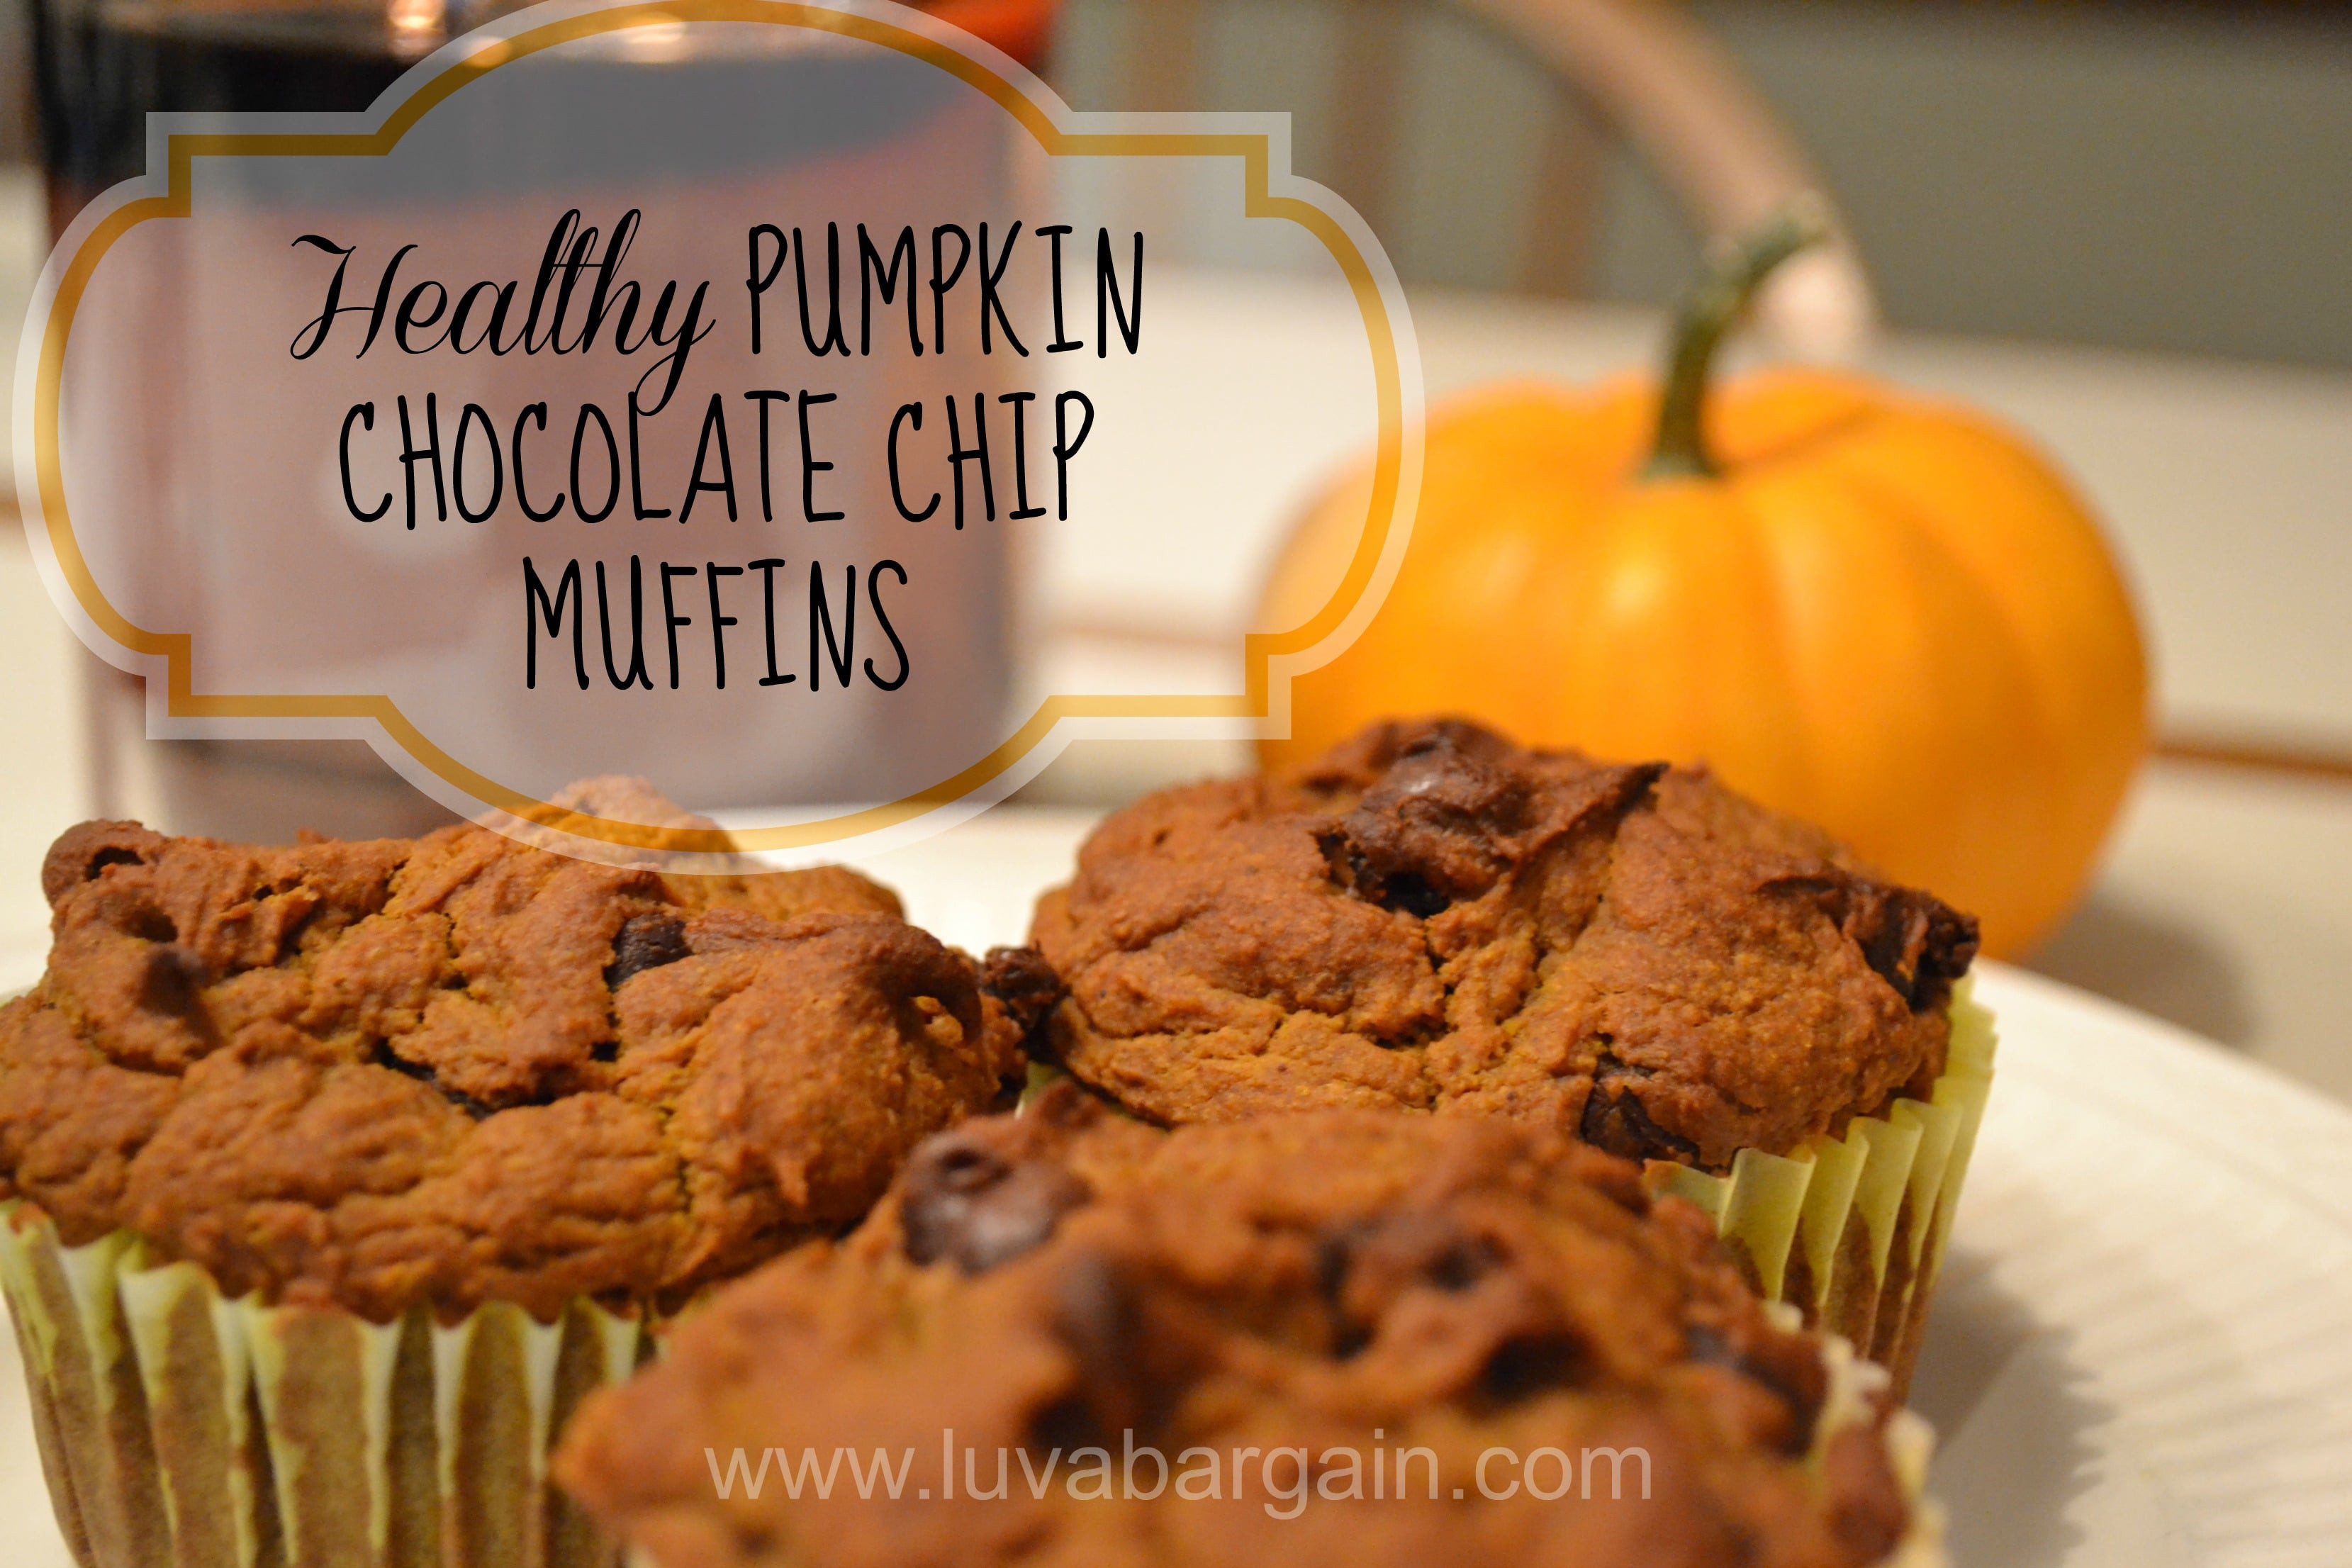 Healthy Pumpkin Chocolate Chip Muffins  Healthy Pumpkin Chocolate Chip Muffins